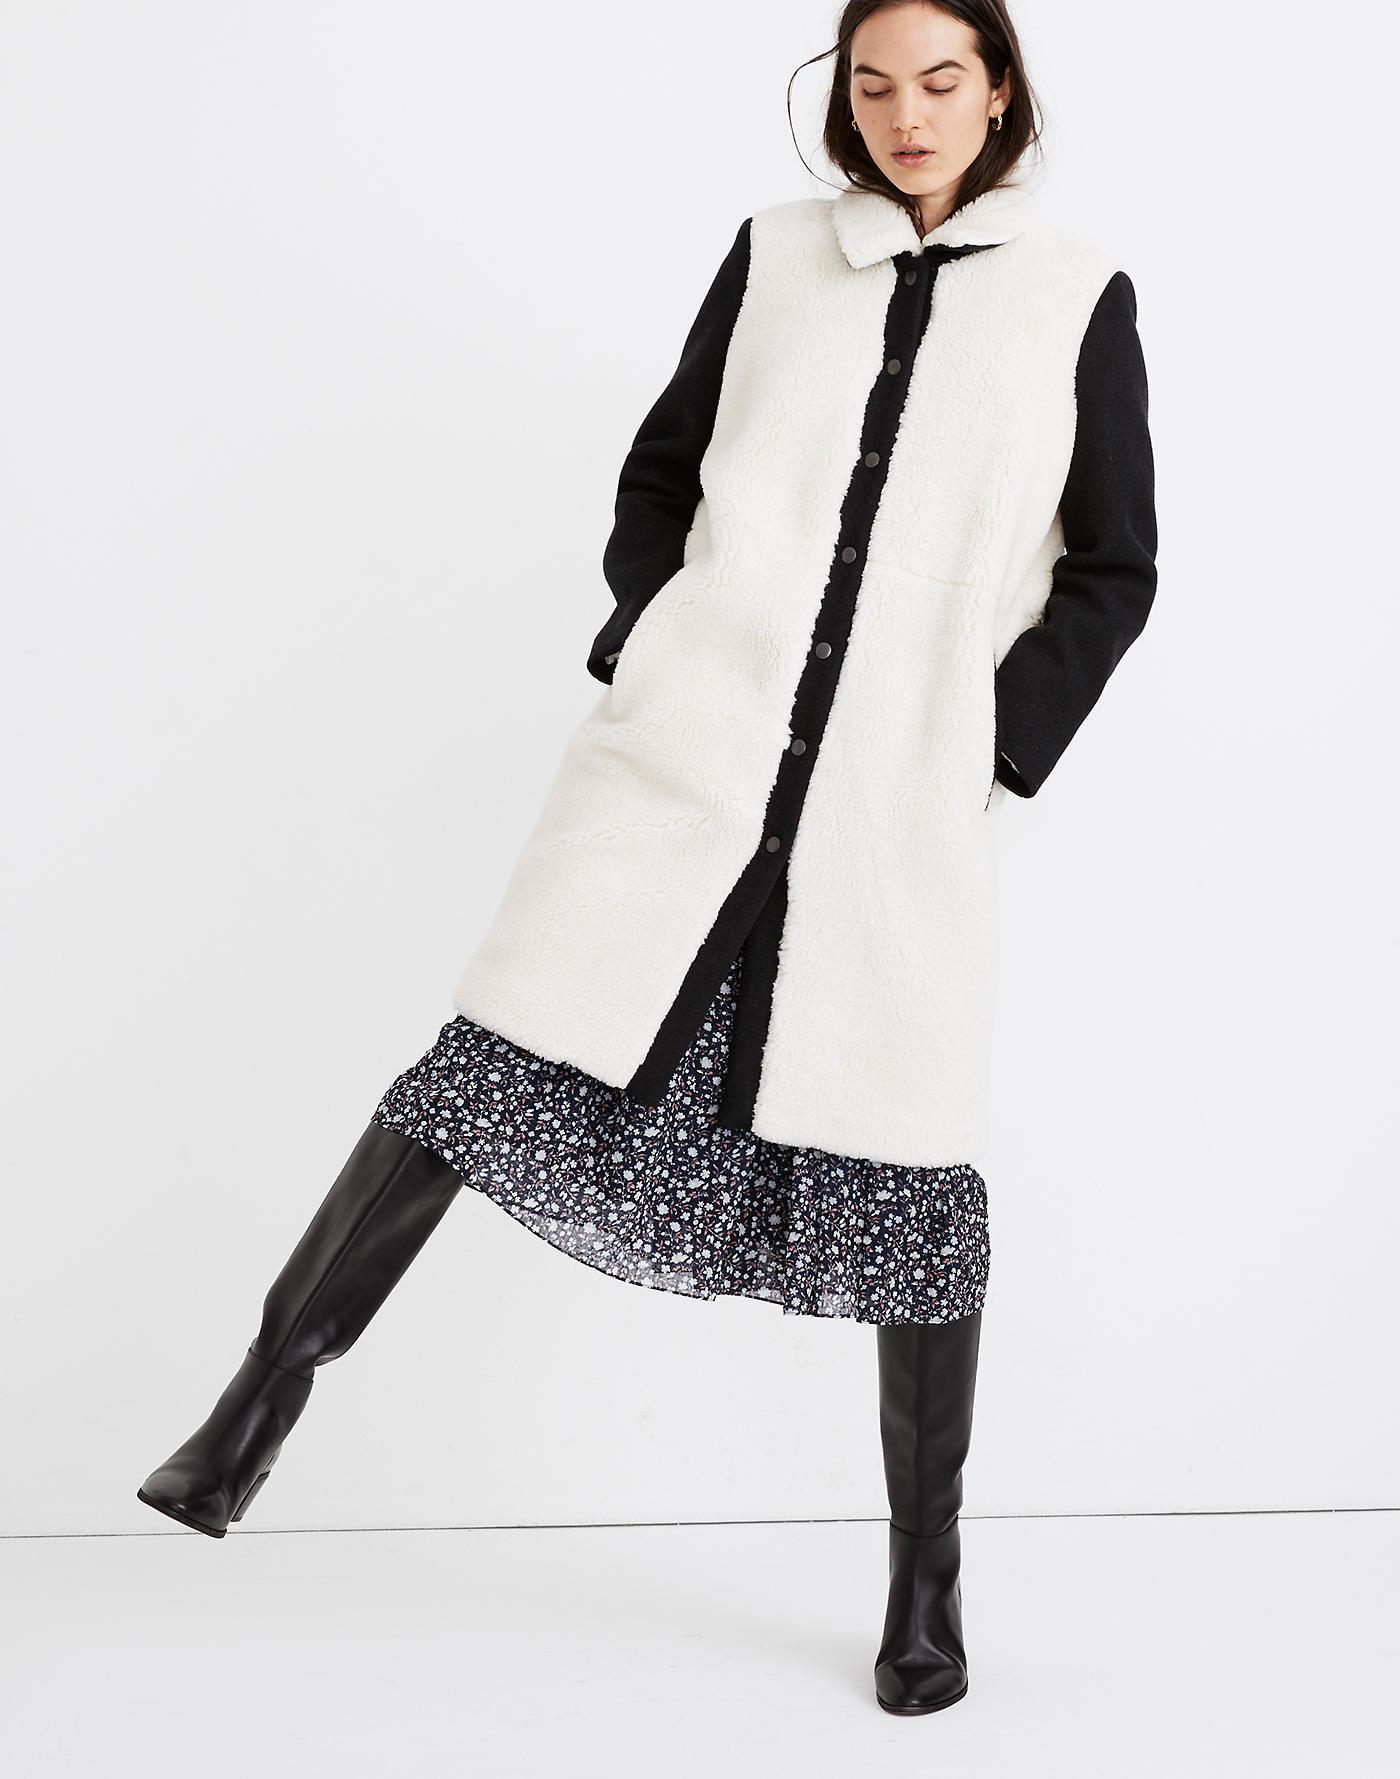 Model wearing black and white coat